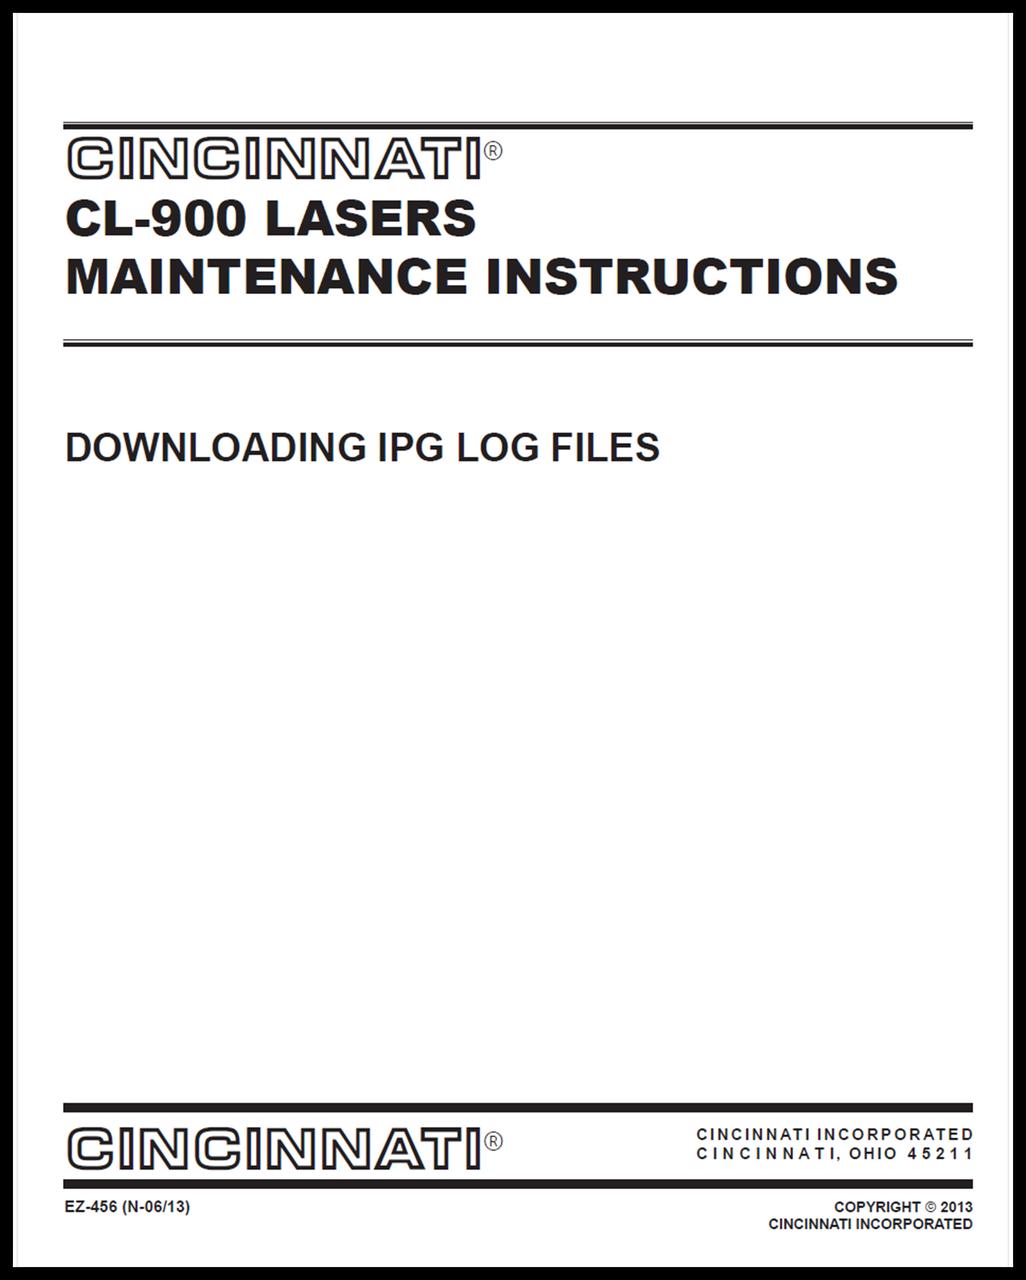 EZ-456 (N 0513) Downloading IPG Log Files via LaserNet